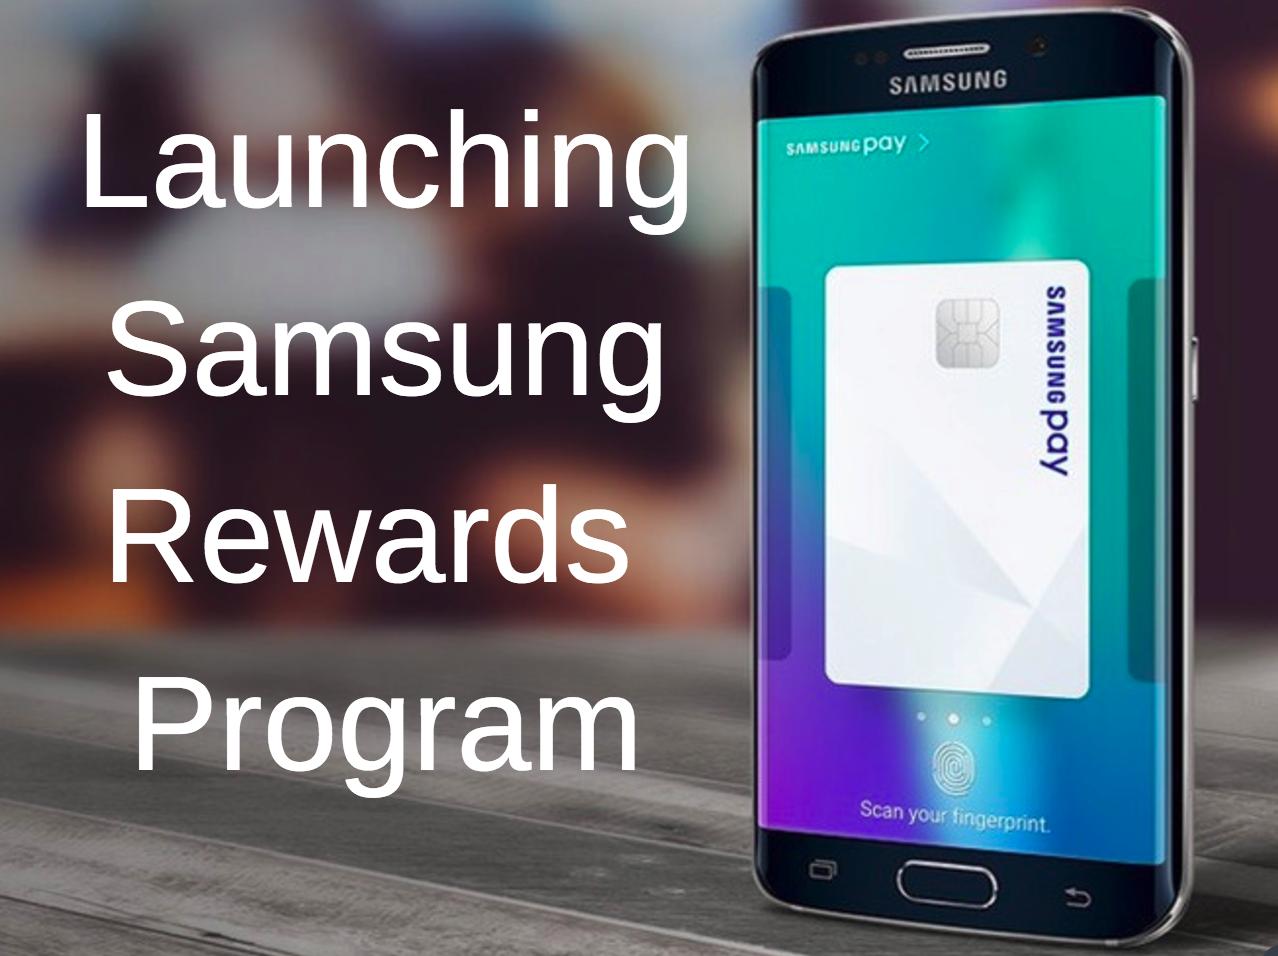 Samsung Rewards Program